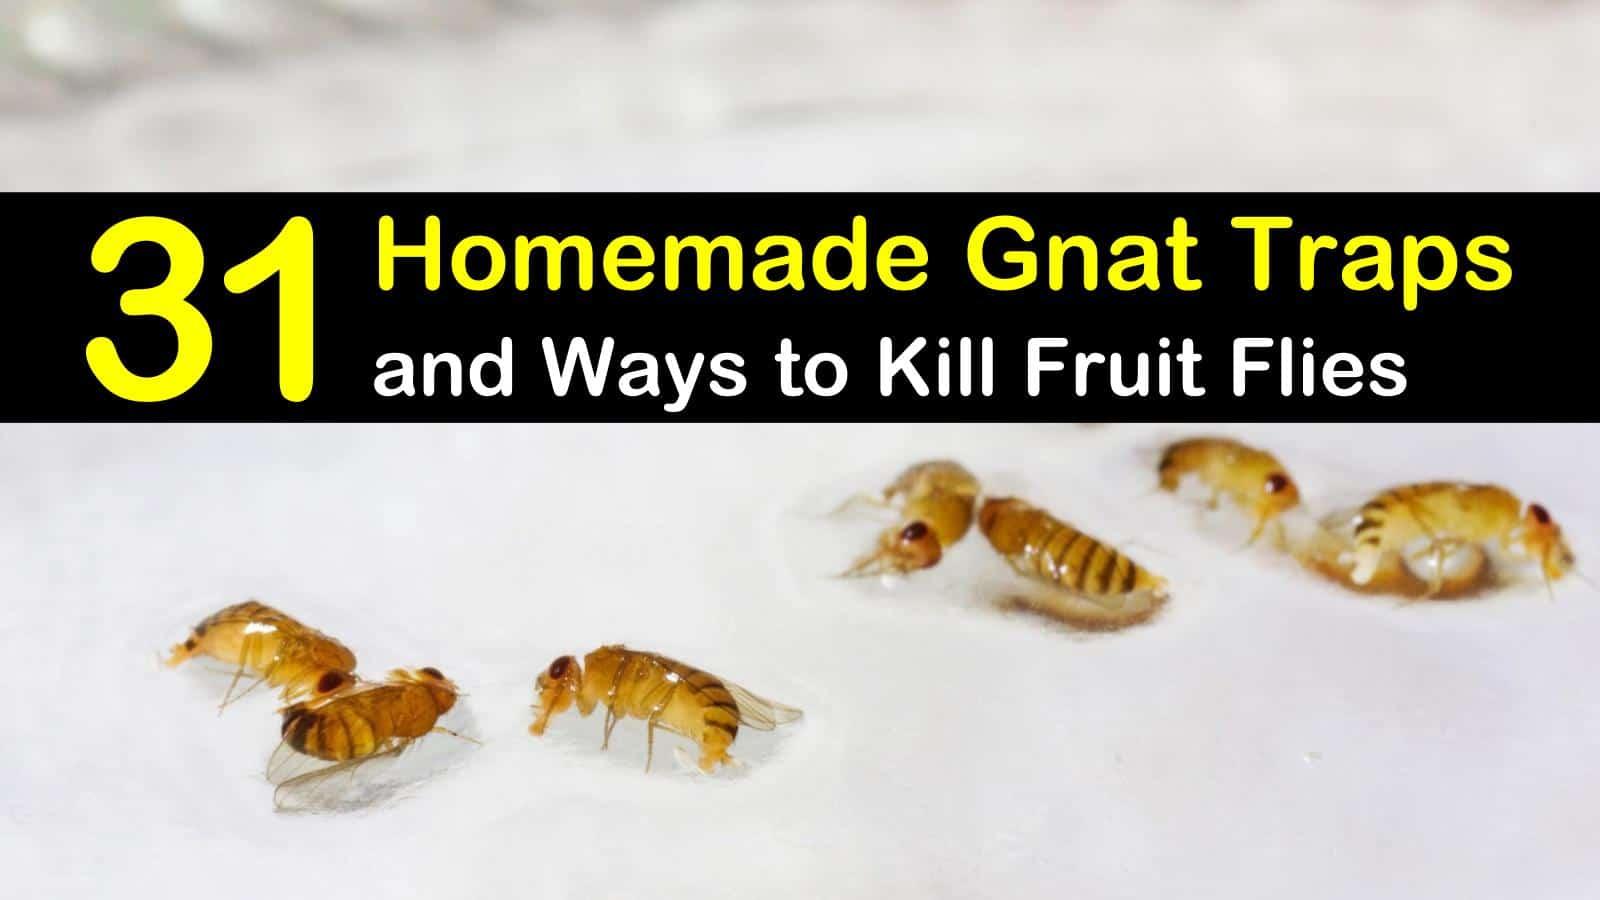 31 homemade gnat traps and ways to kill